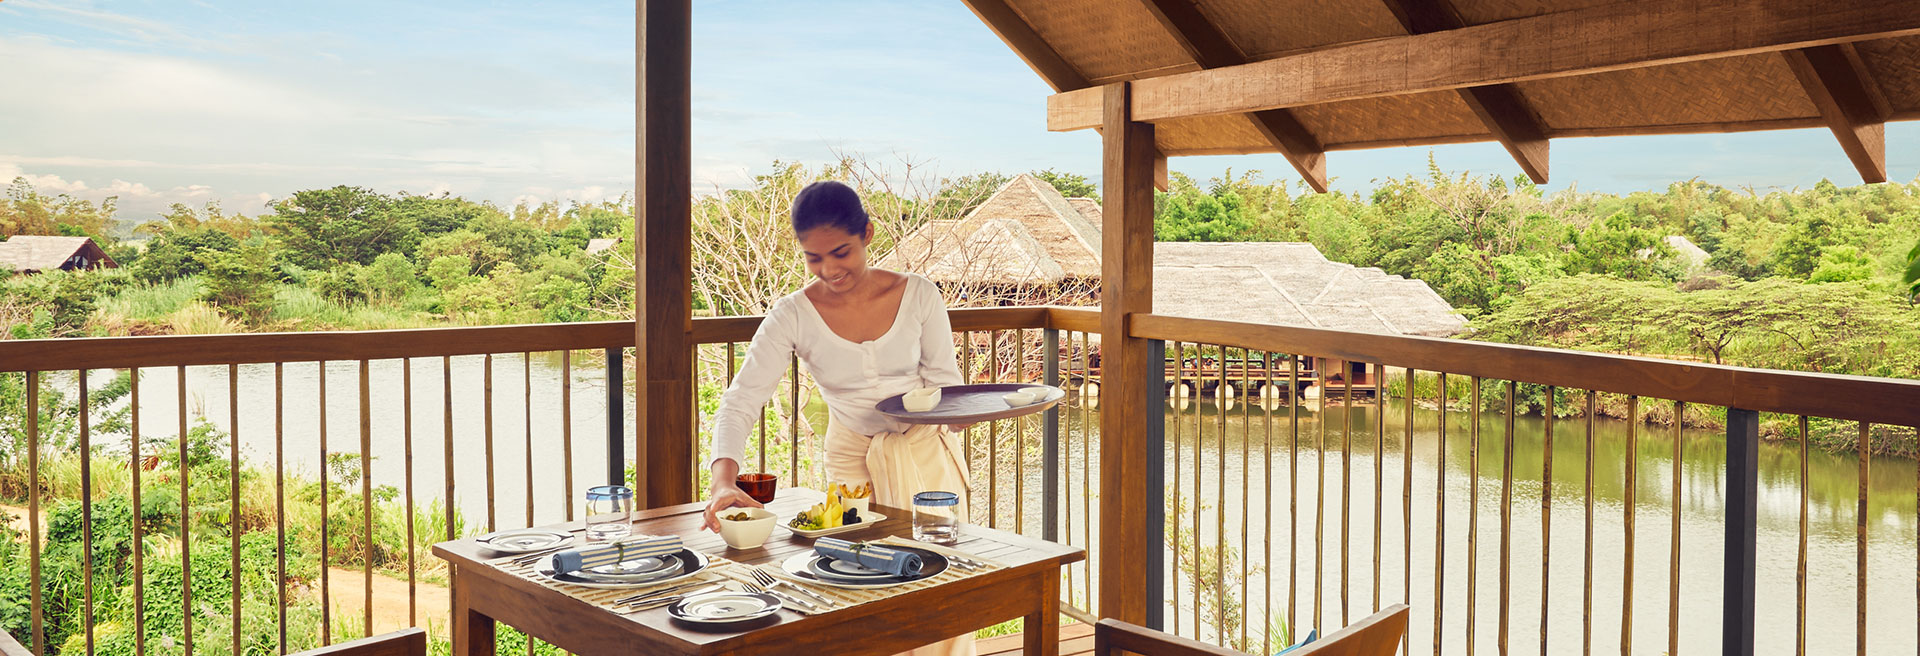 Dining at Sigiriya Restaurants